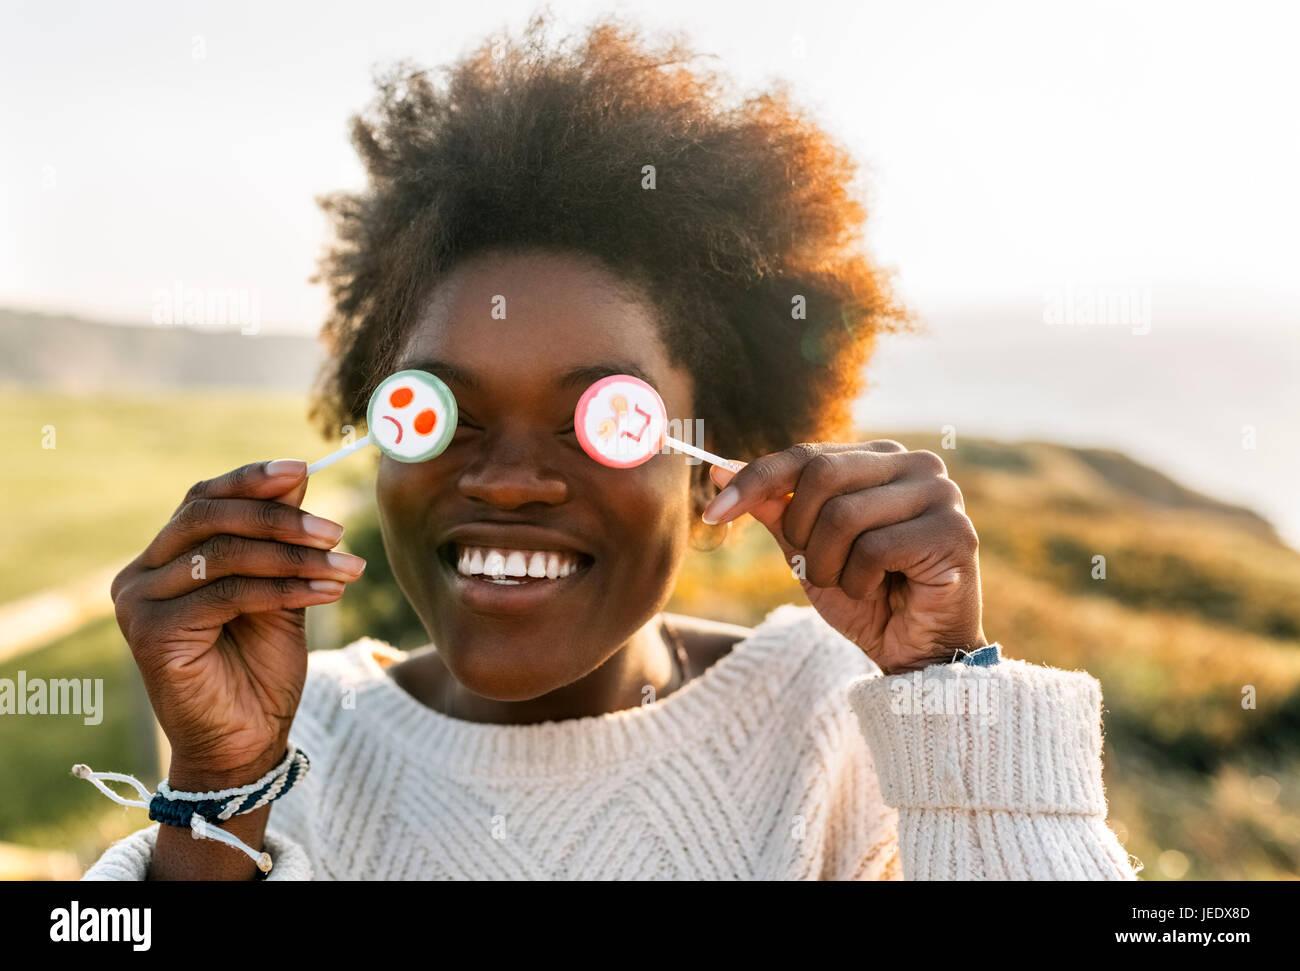 Mujer joven divirtiéndose con lollipops Imagen De Stock